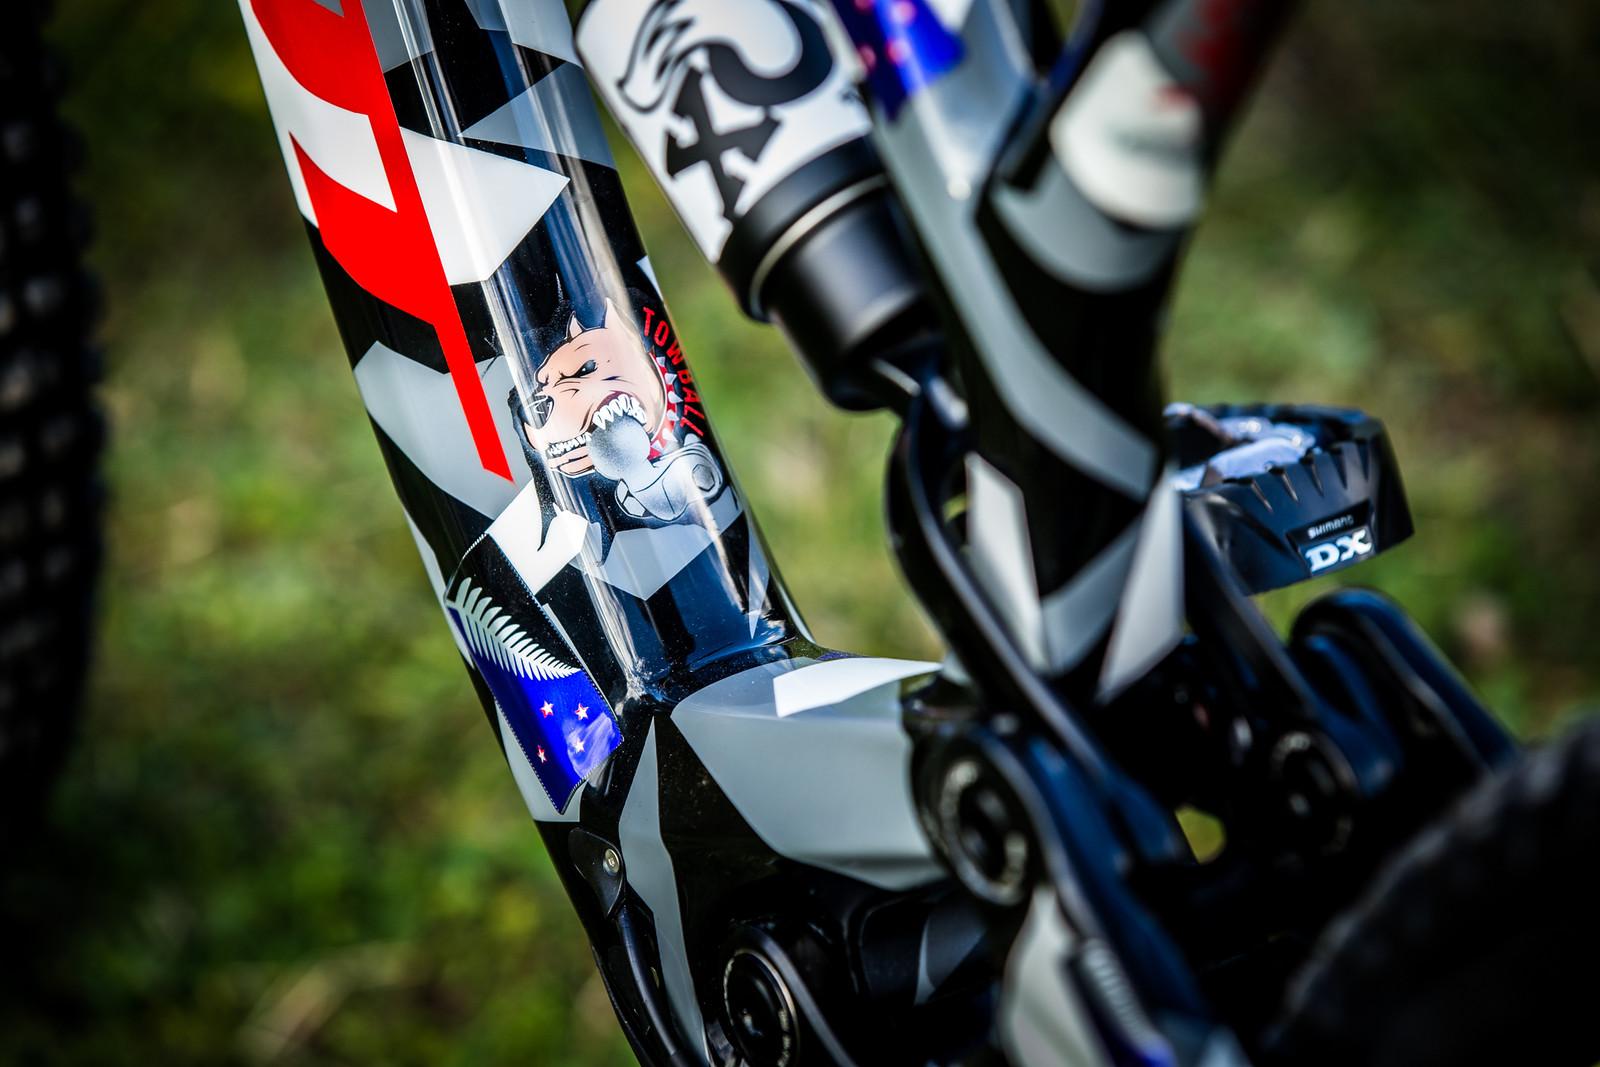 Towball! - WORLD CHAMPS BIKE - Eddie Masters' Pivot Phoenix - Mountain Biking Pictures - Vital MTB